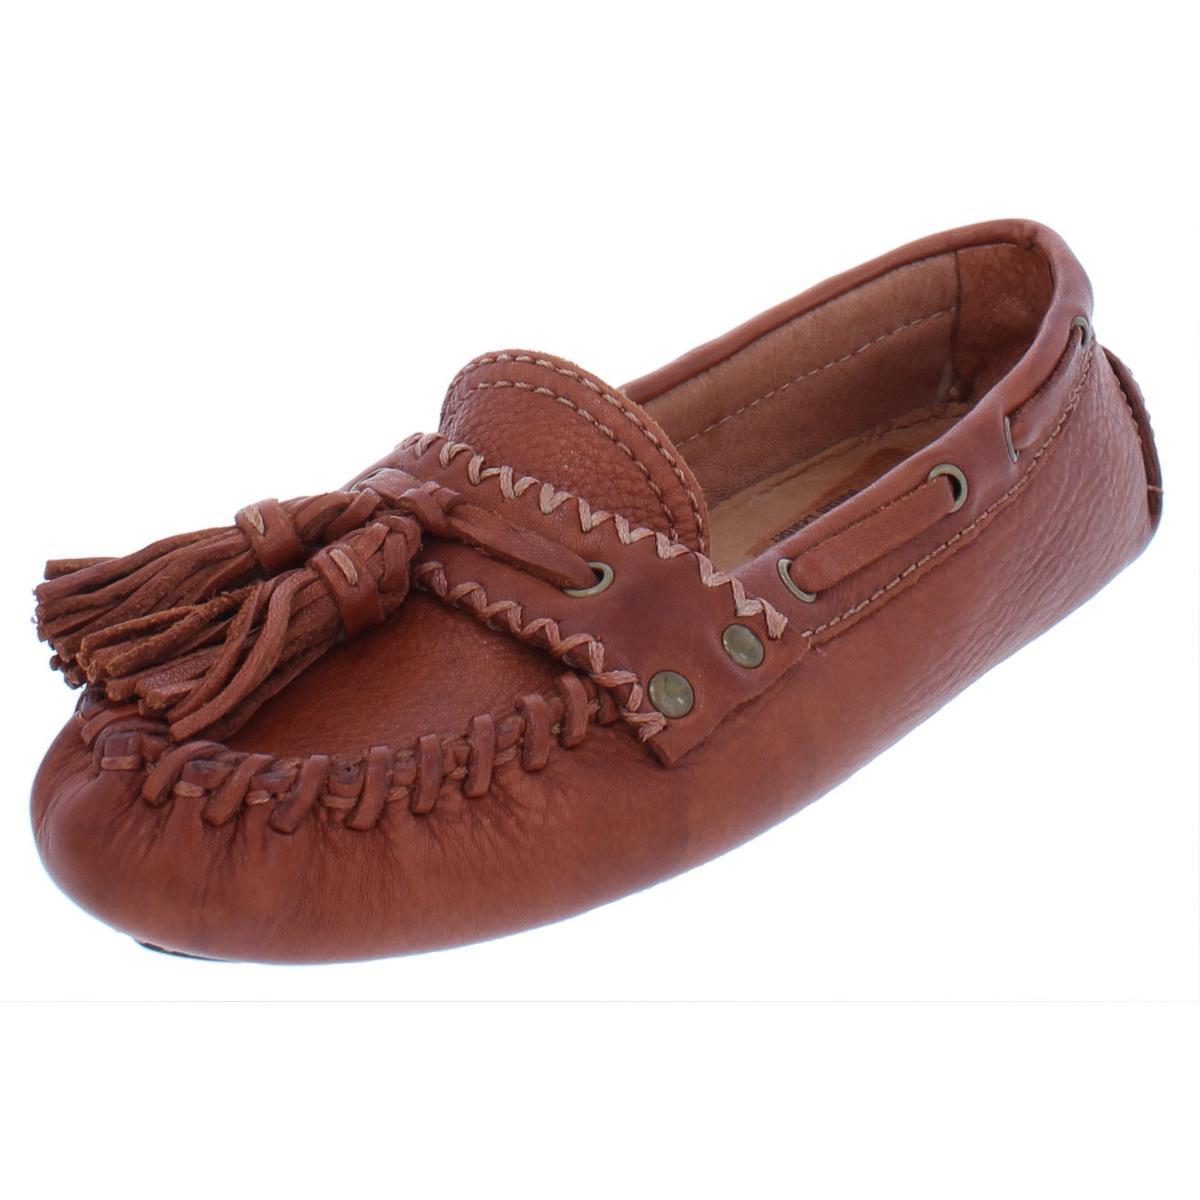 a9770e49880 Patricia Nash Womens Domenica Tan Leather Loafers Shoes 6 Medium (B ...